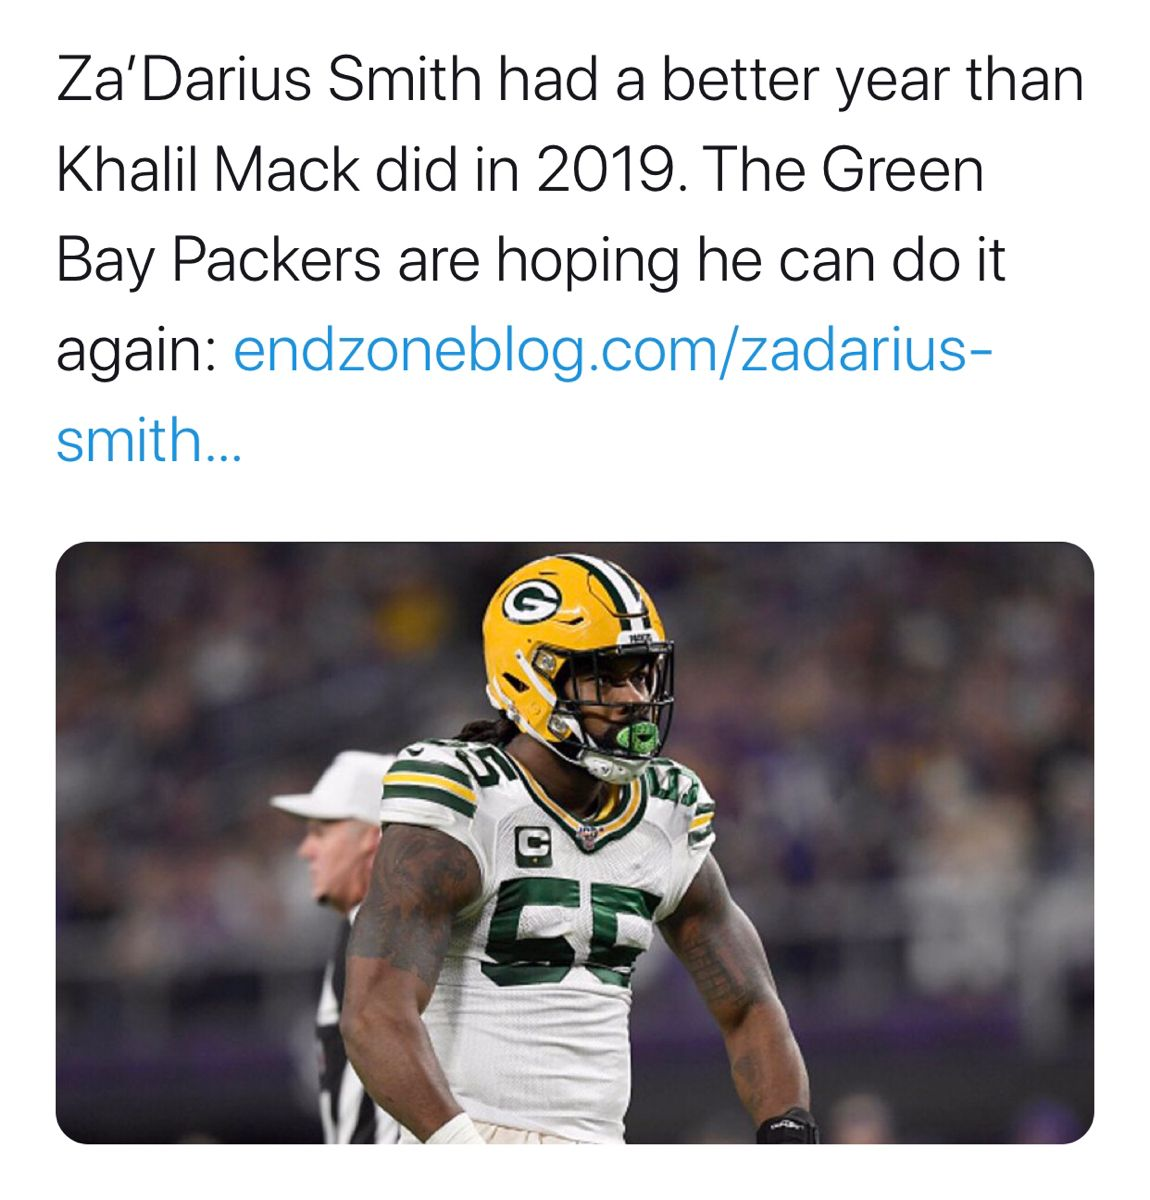 Za Darius Smith Had A Better Year Than Khalil Mack Did In 2019 In 2020 Football Streaming Live Football Streaming Semi Pro Football